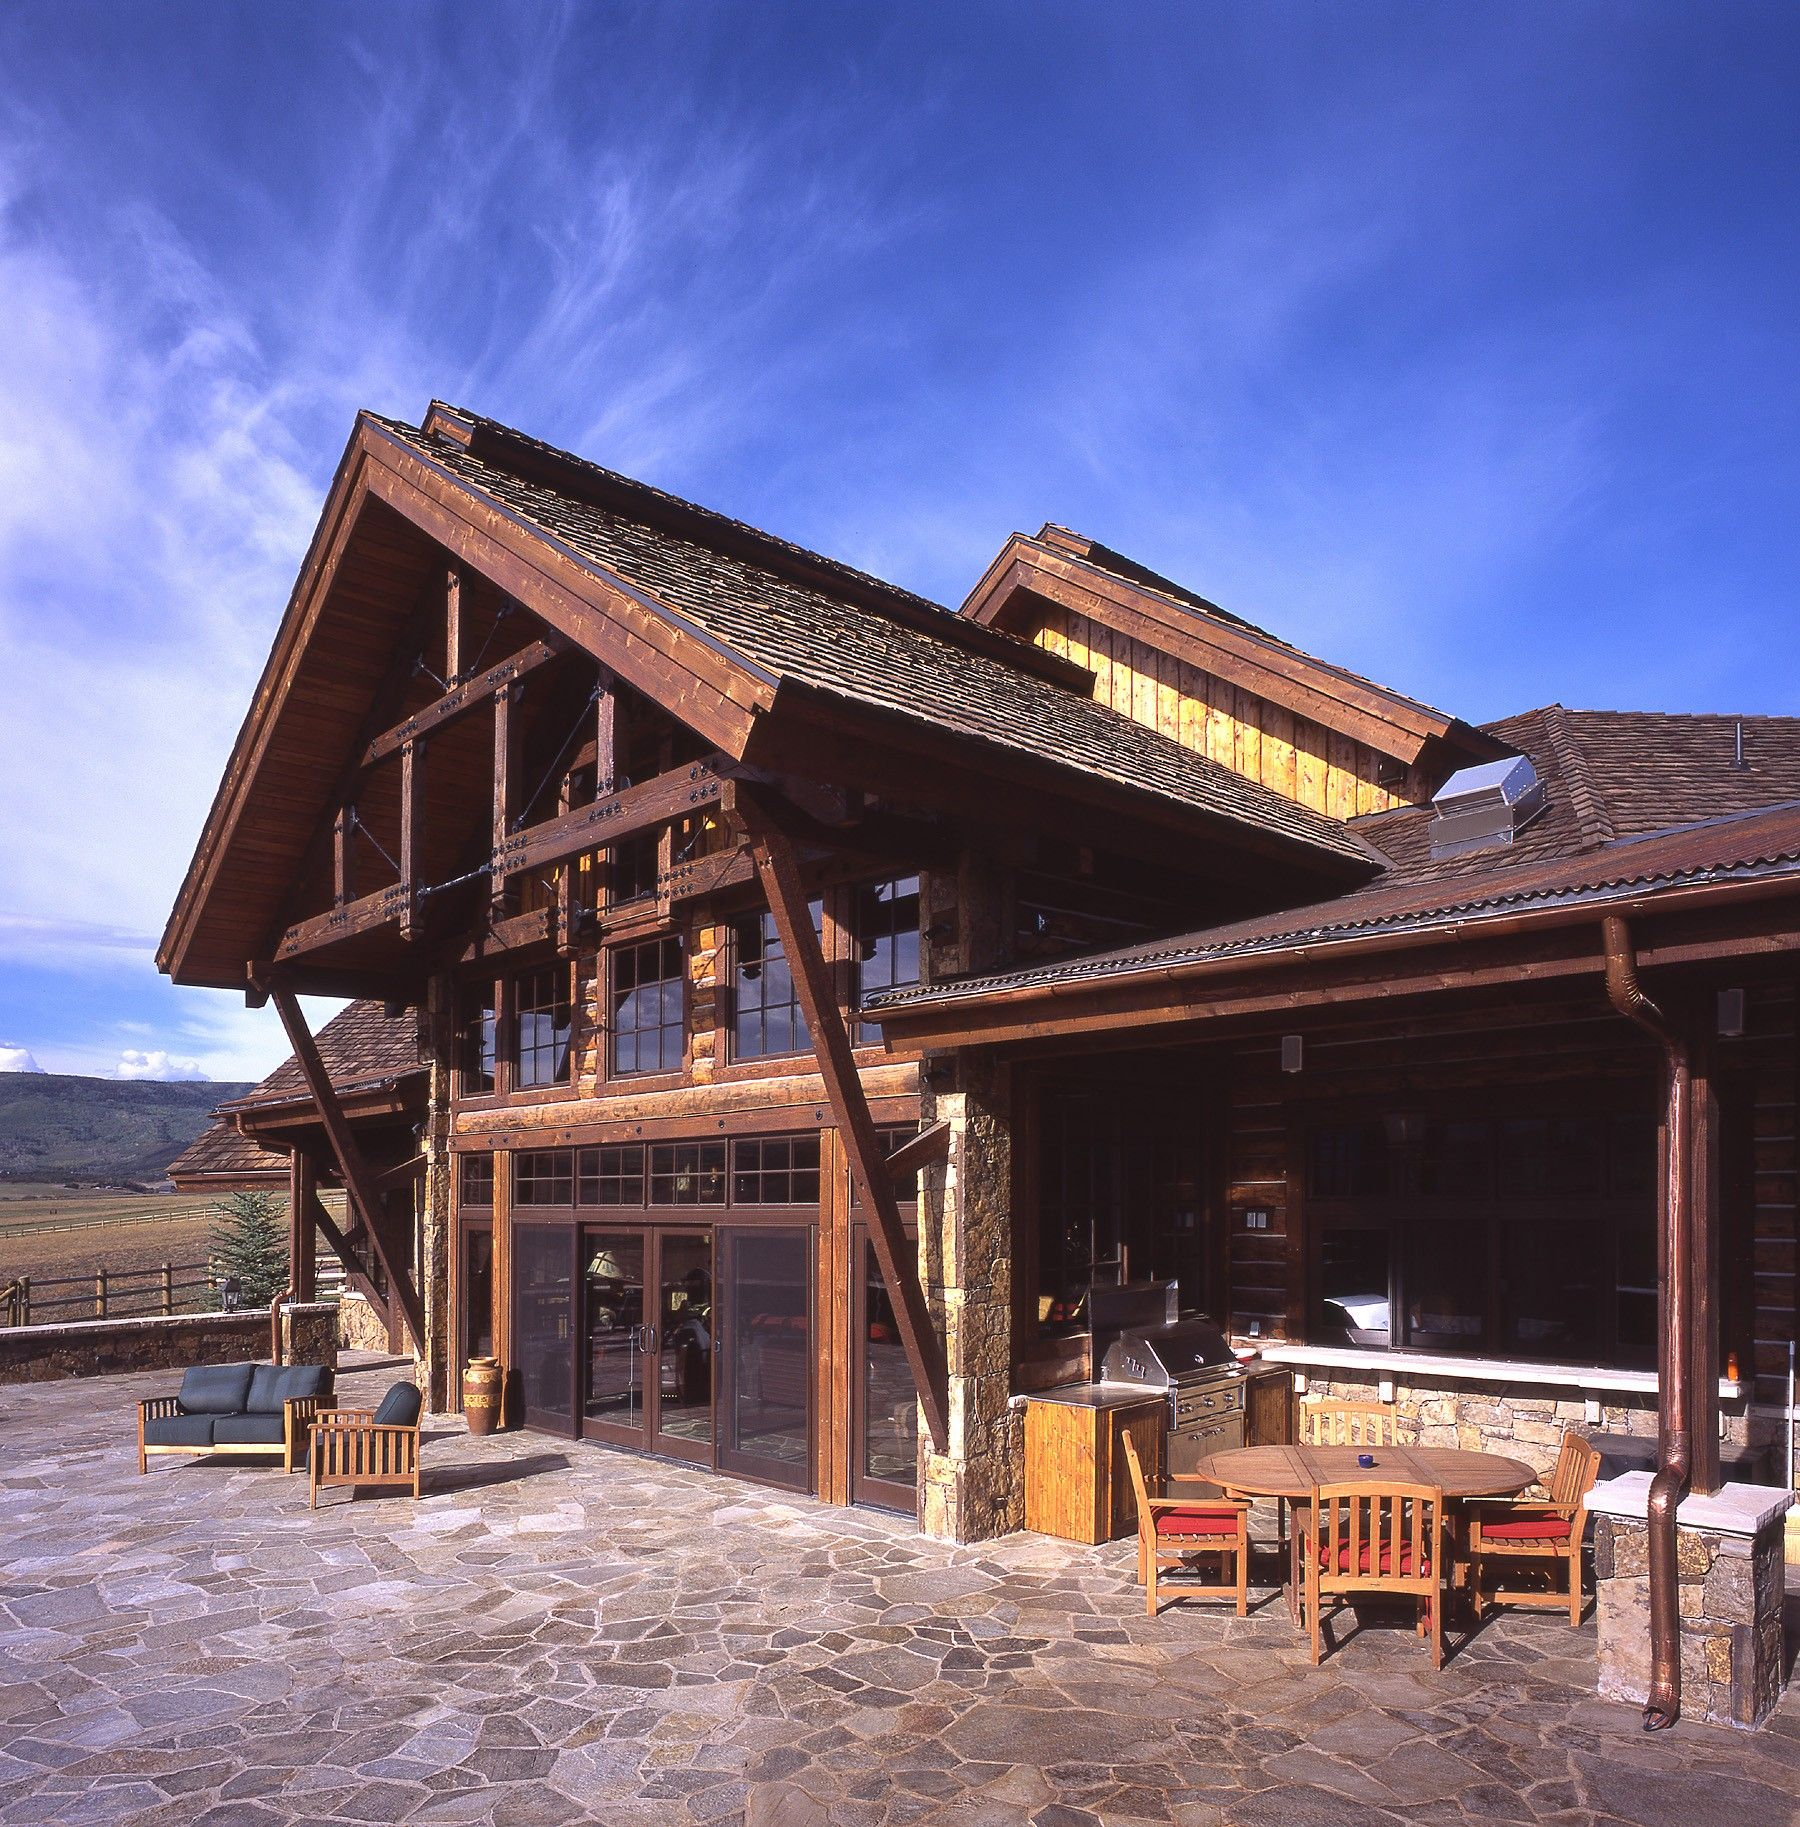 Architect Fort Collins   Architect, Architecture design ...